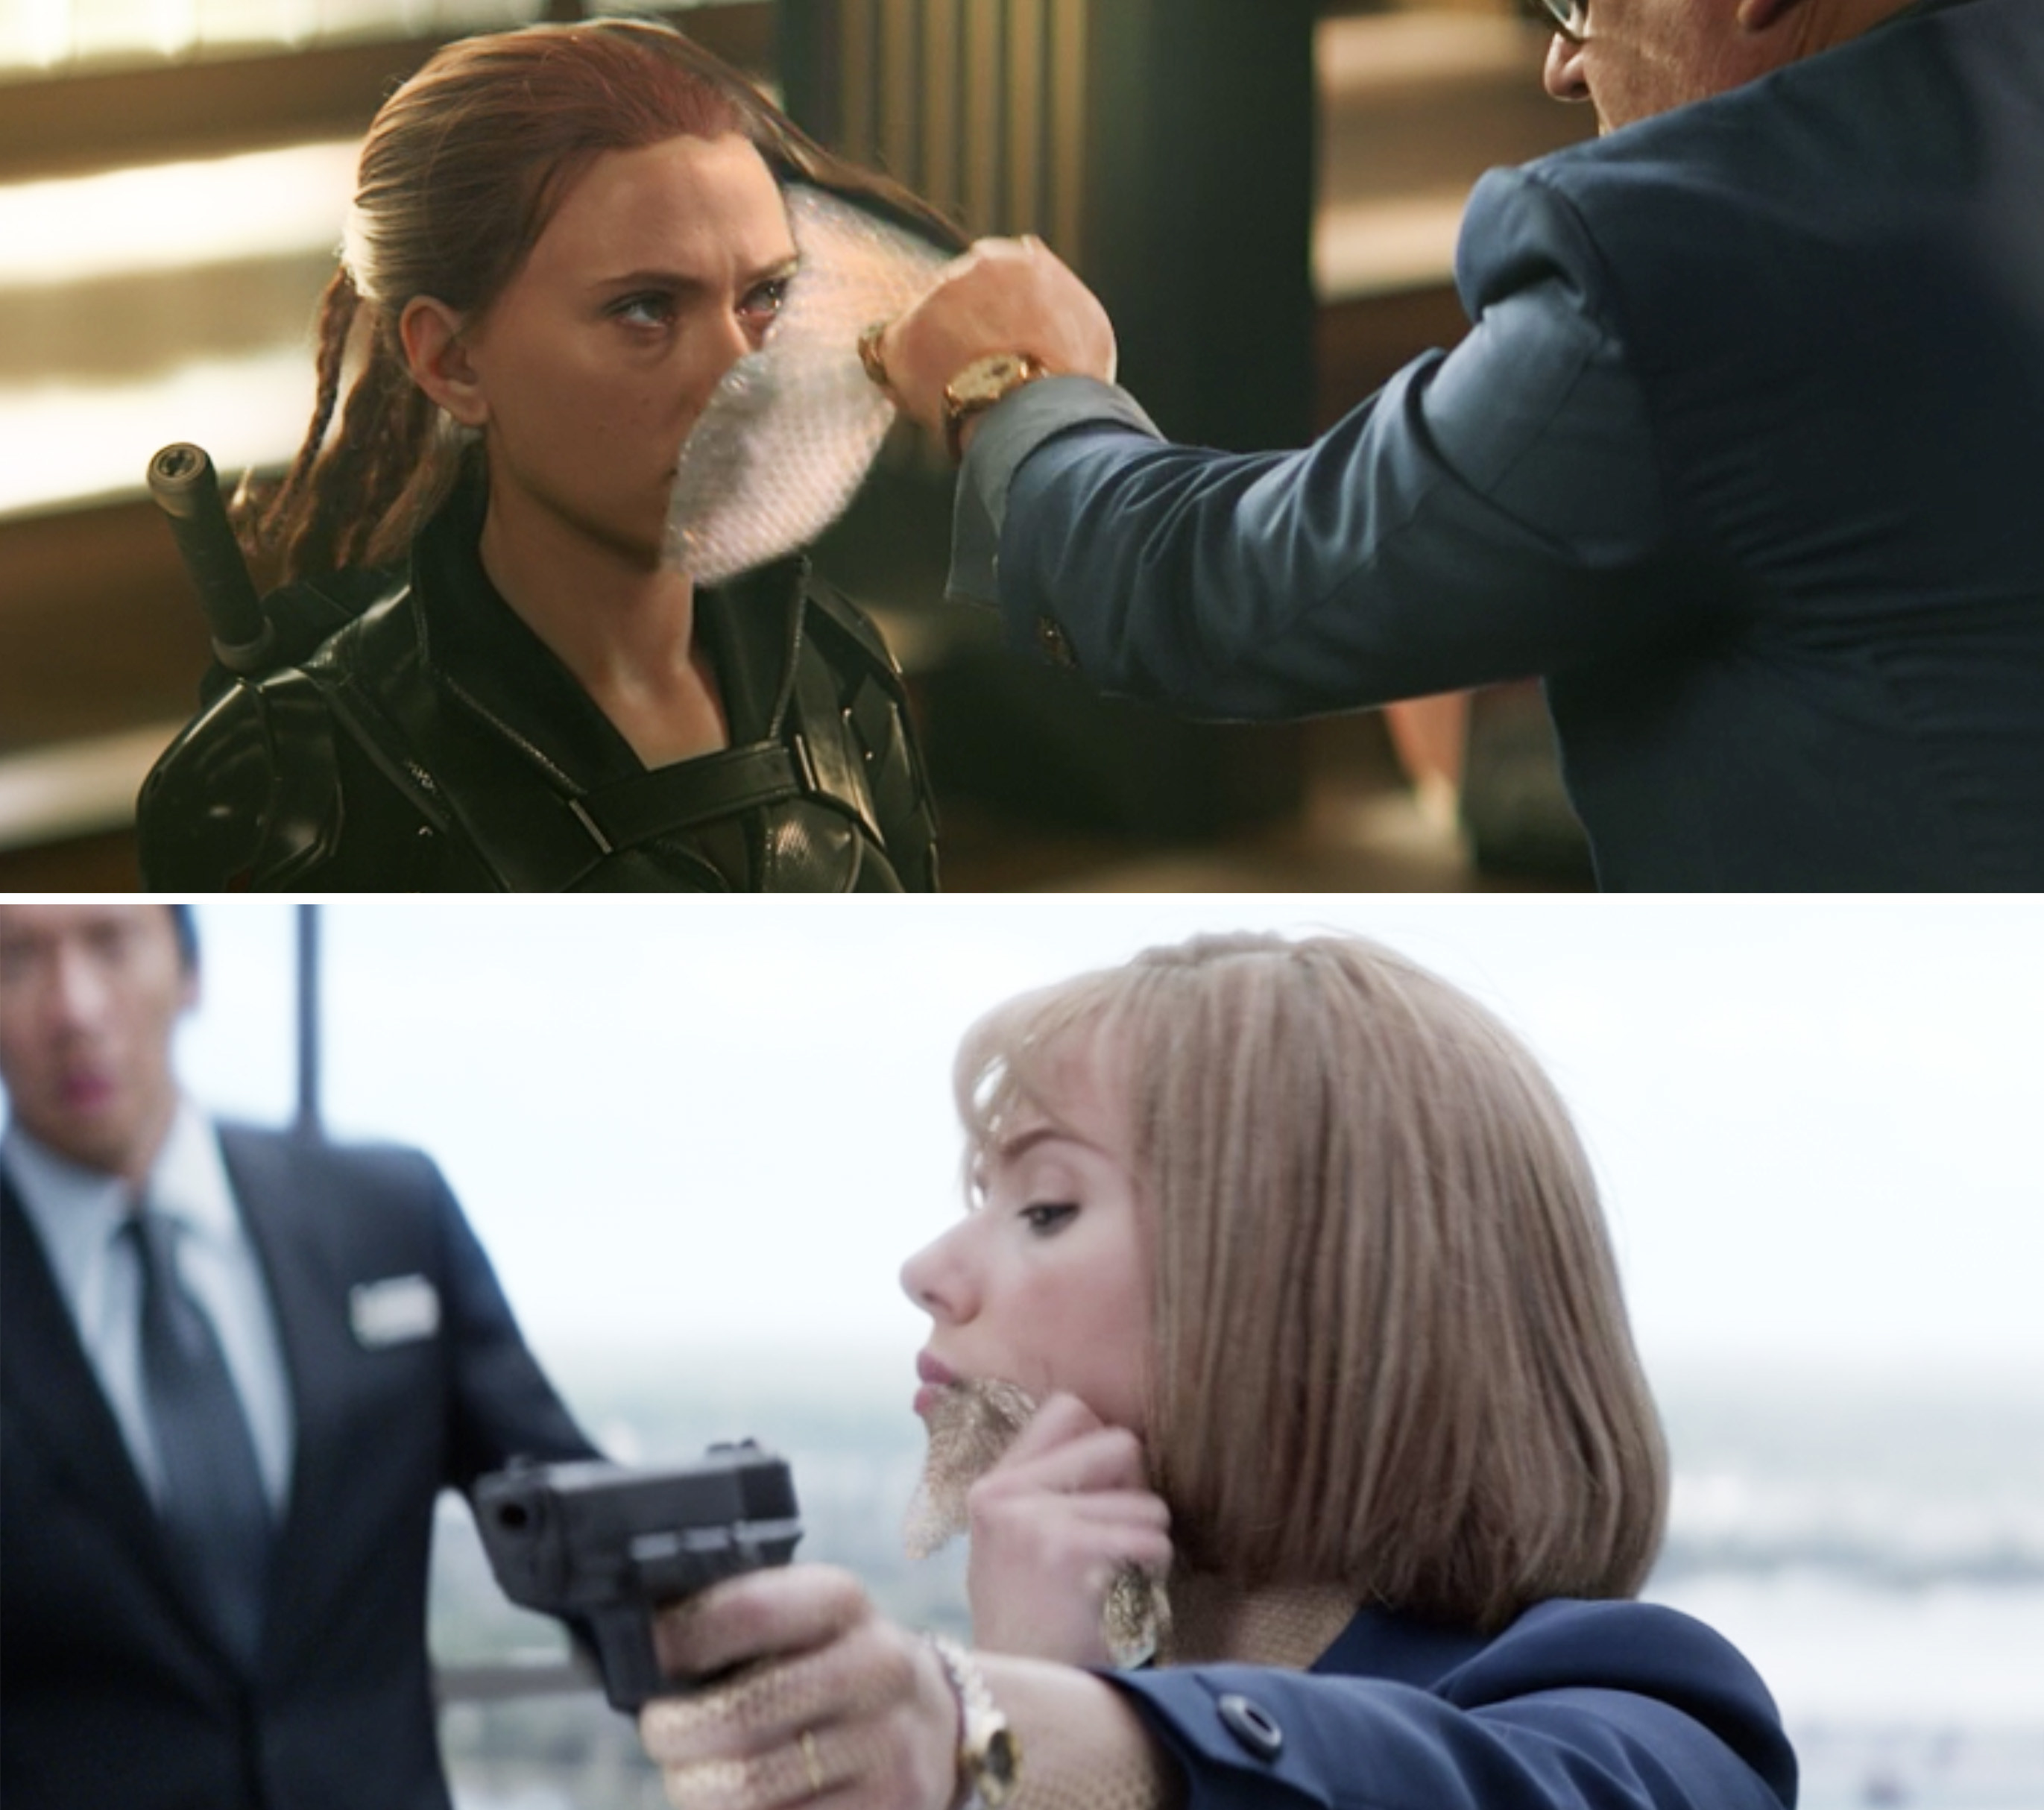 Dreykov peeling off Natasha's mask vs. Natasha peeling off her mask in Winter Soldier